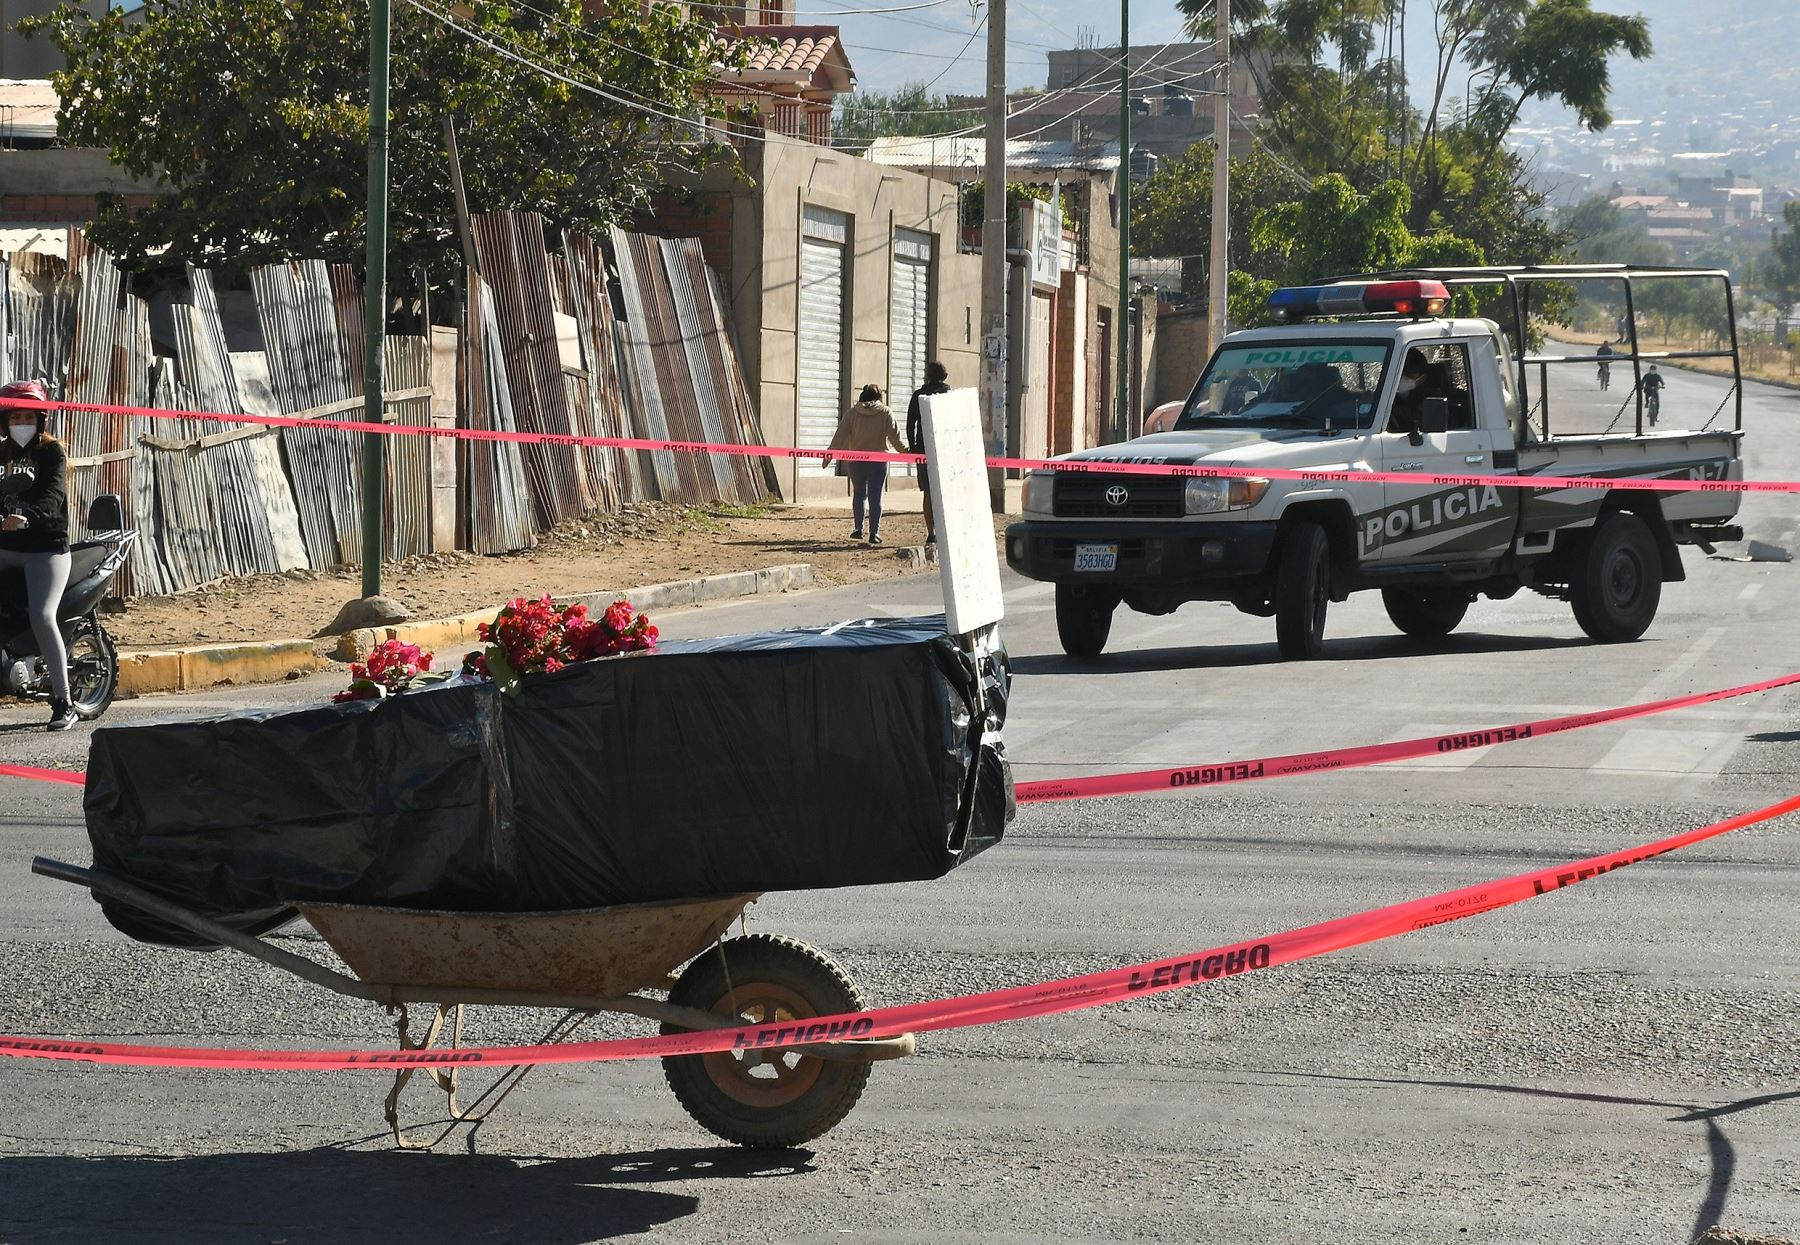 n ataúd con un fallecido por coronavirus fue colocado en plena calle como protesta por no poder enterrarlo o incinerarlo, este sábado en Cochabamba (Bolivia). Foto: EFE